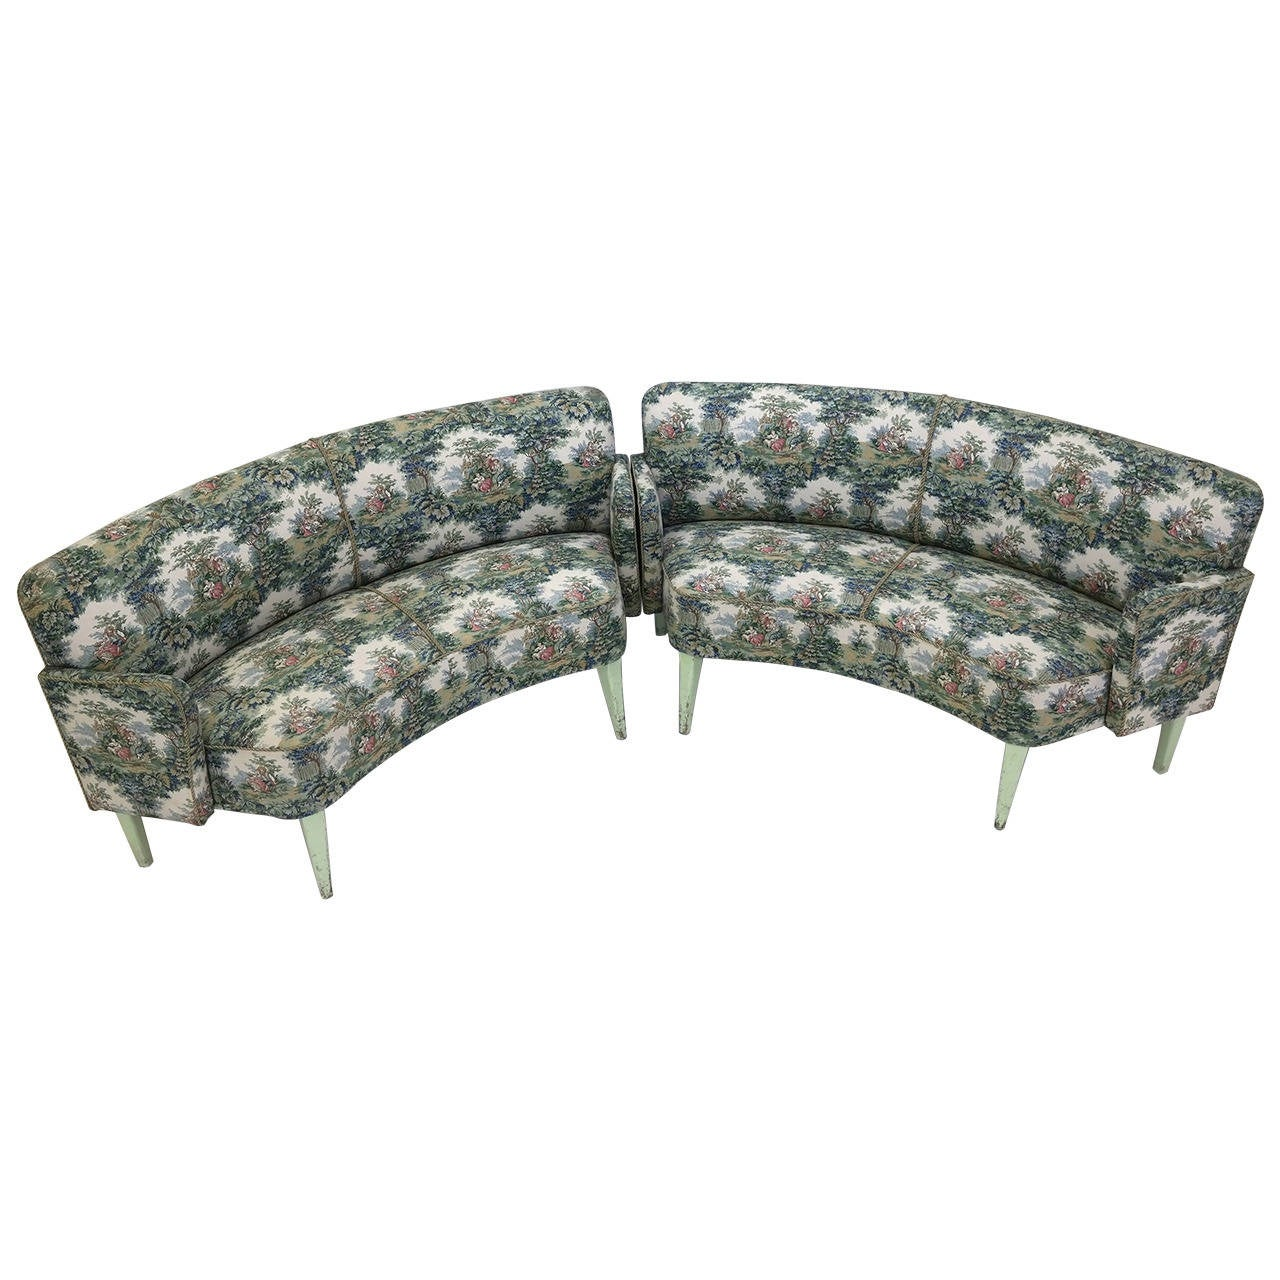 Historical sofas from divan two in tivoli garden copenhagen for Divan 1 tivoli